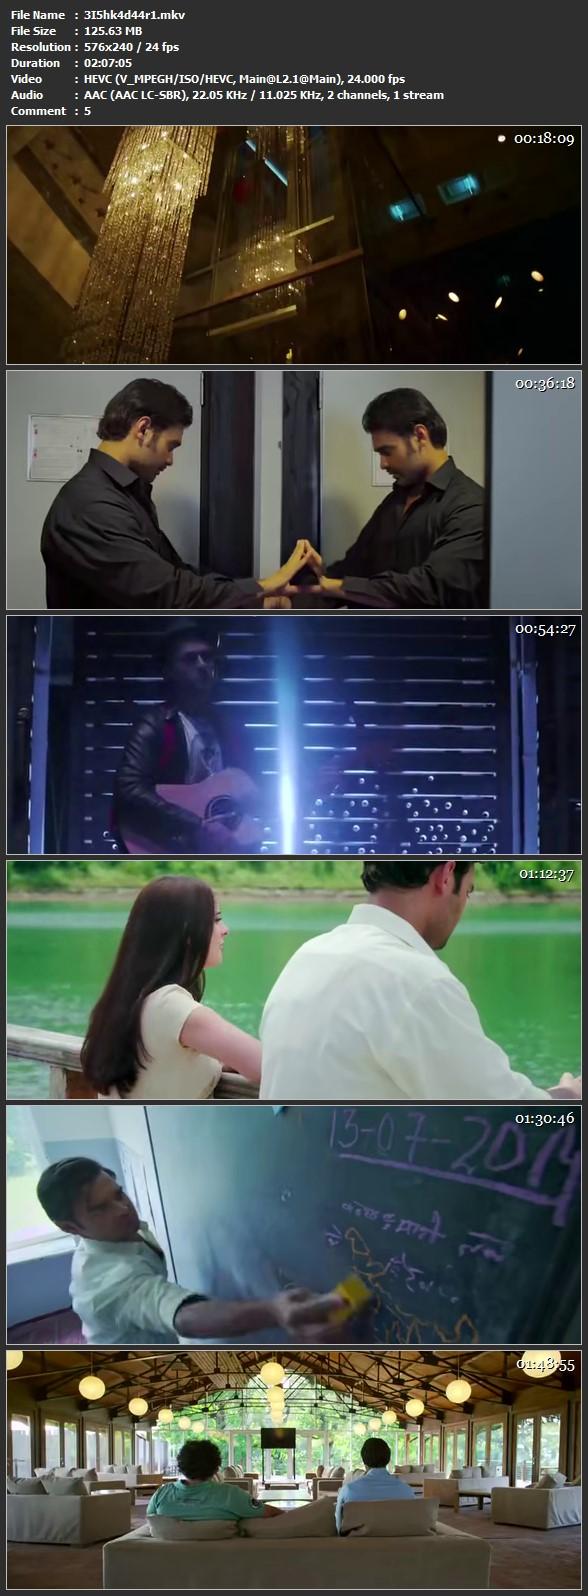 Ishqedarriyaan (2015) Bollywood Hindi Movie PreDvDRip HEVC 100MB 150MB 200MB MKV AVI Downloading